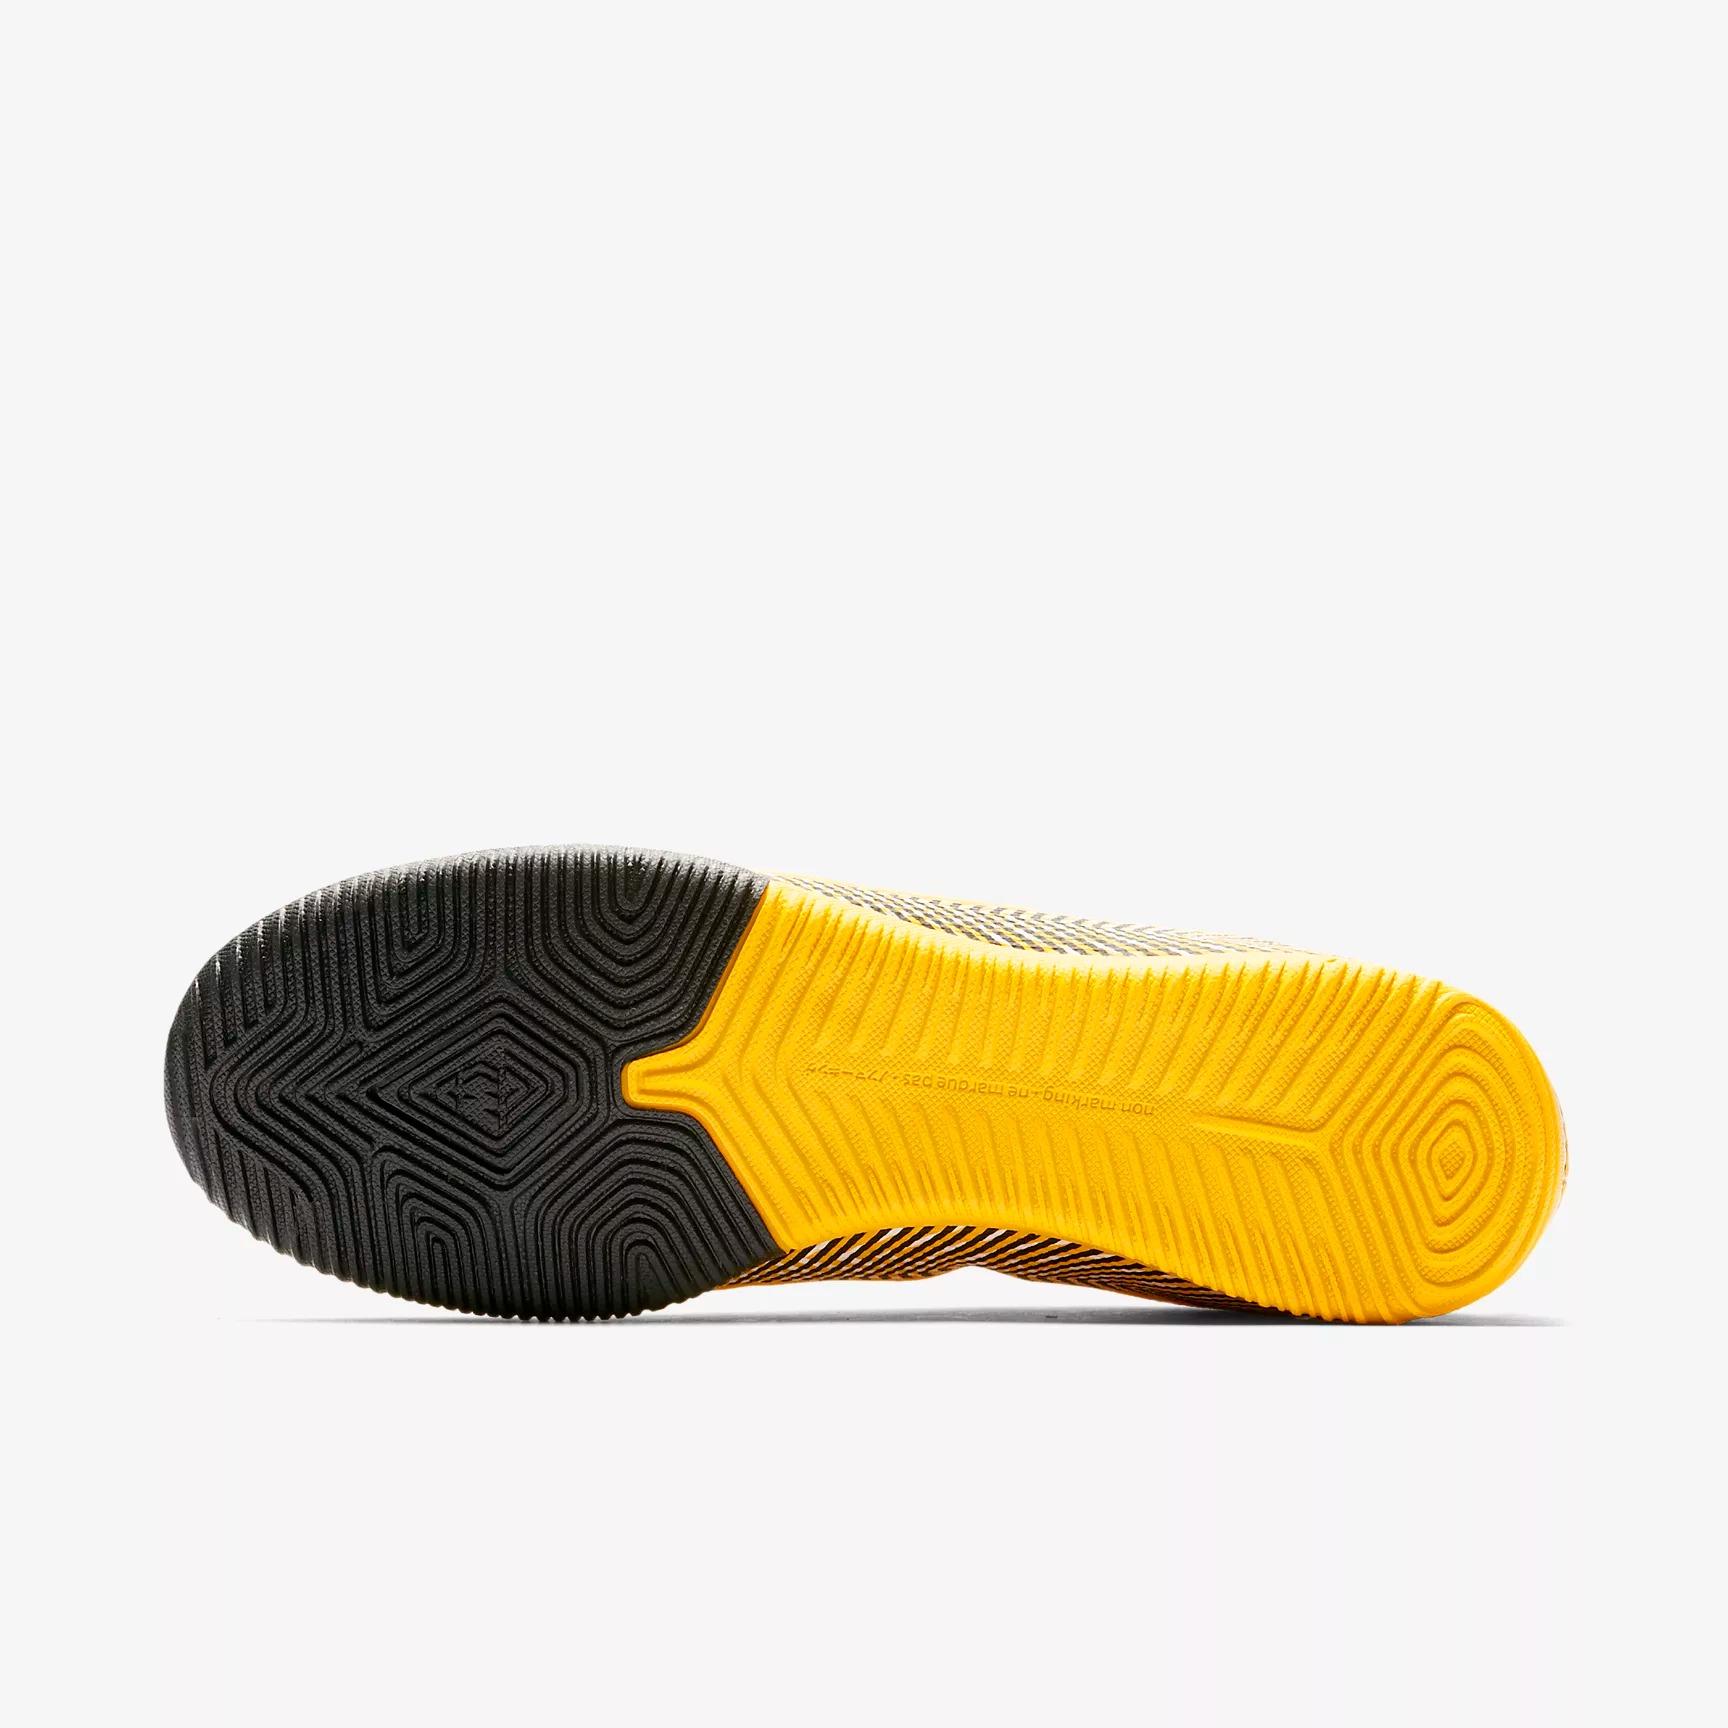 2a65bf65267 Nike Mercurial Vapor XII Academy Neymar Jr. IC Soccer Cleats ...